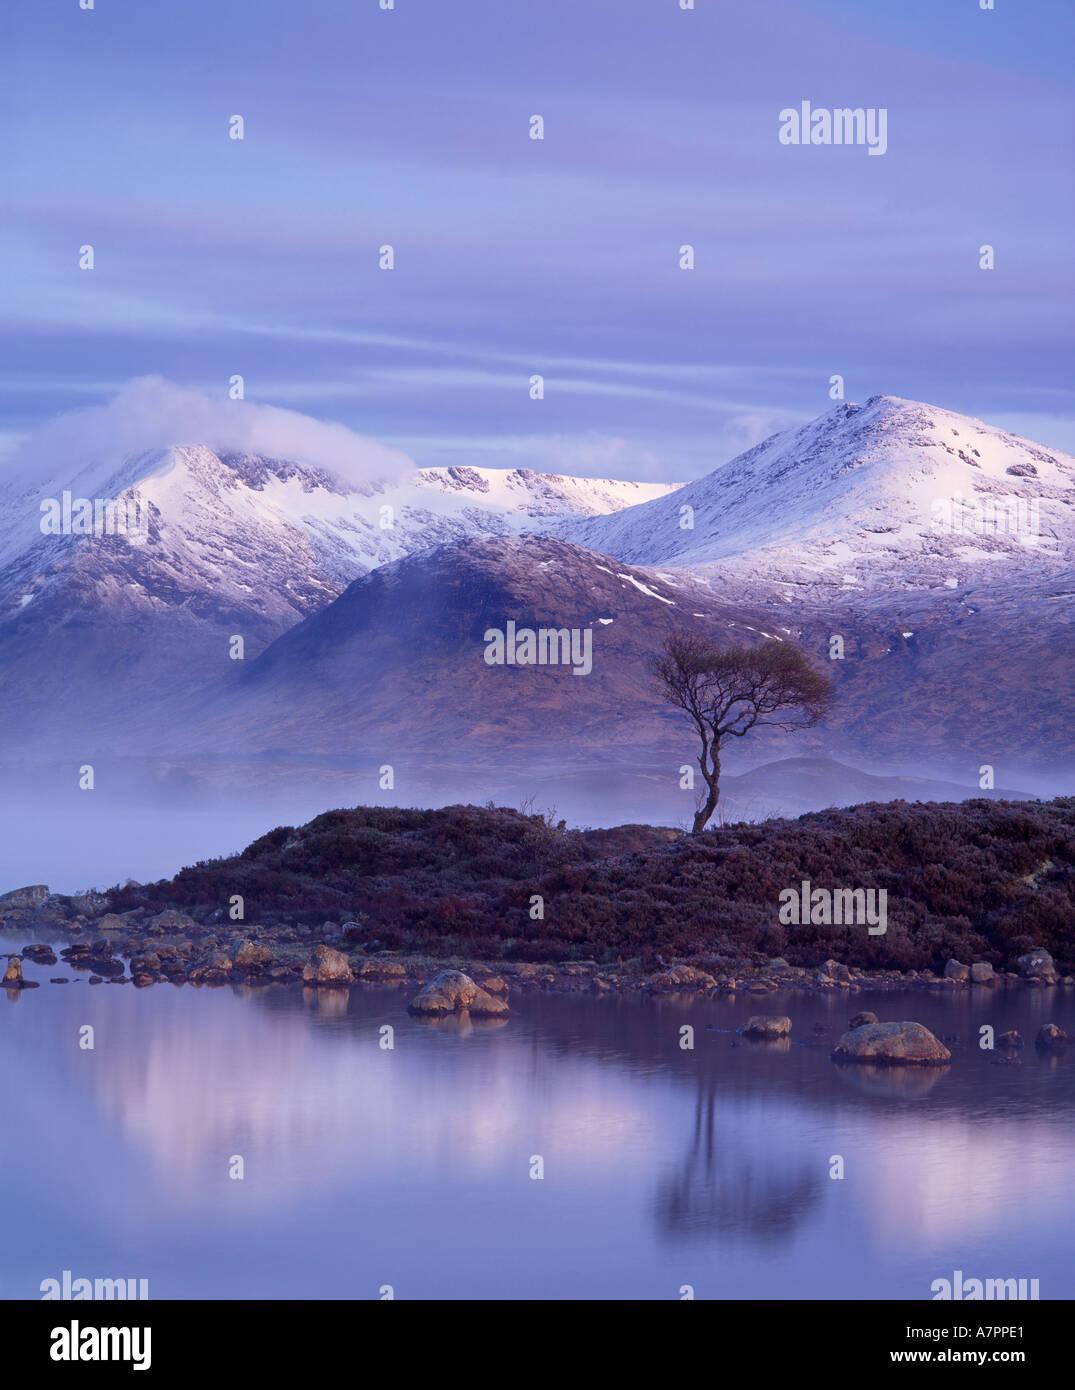 Lochan na h Achlaise, Meall Bhuiridh un et le Mont Noir, Rannoch Moor, Lochaber, Highland, Scotland, UK Photo Stock